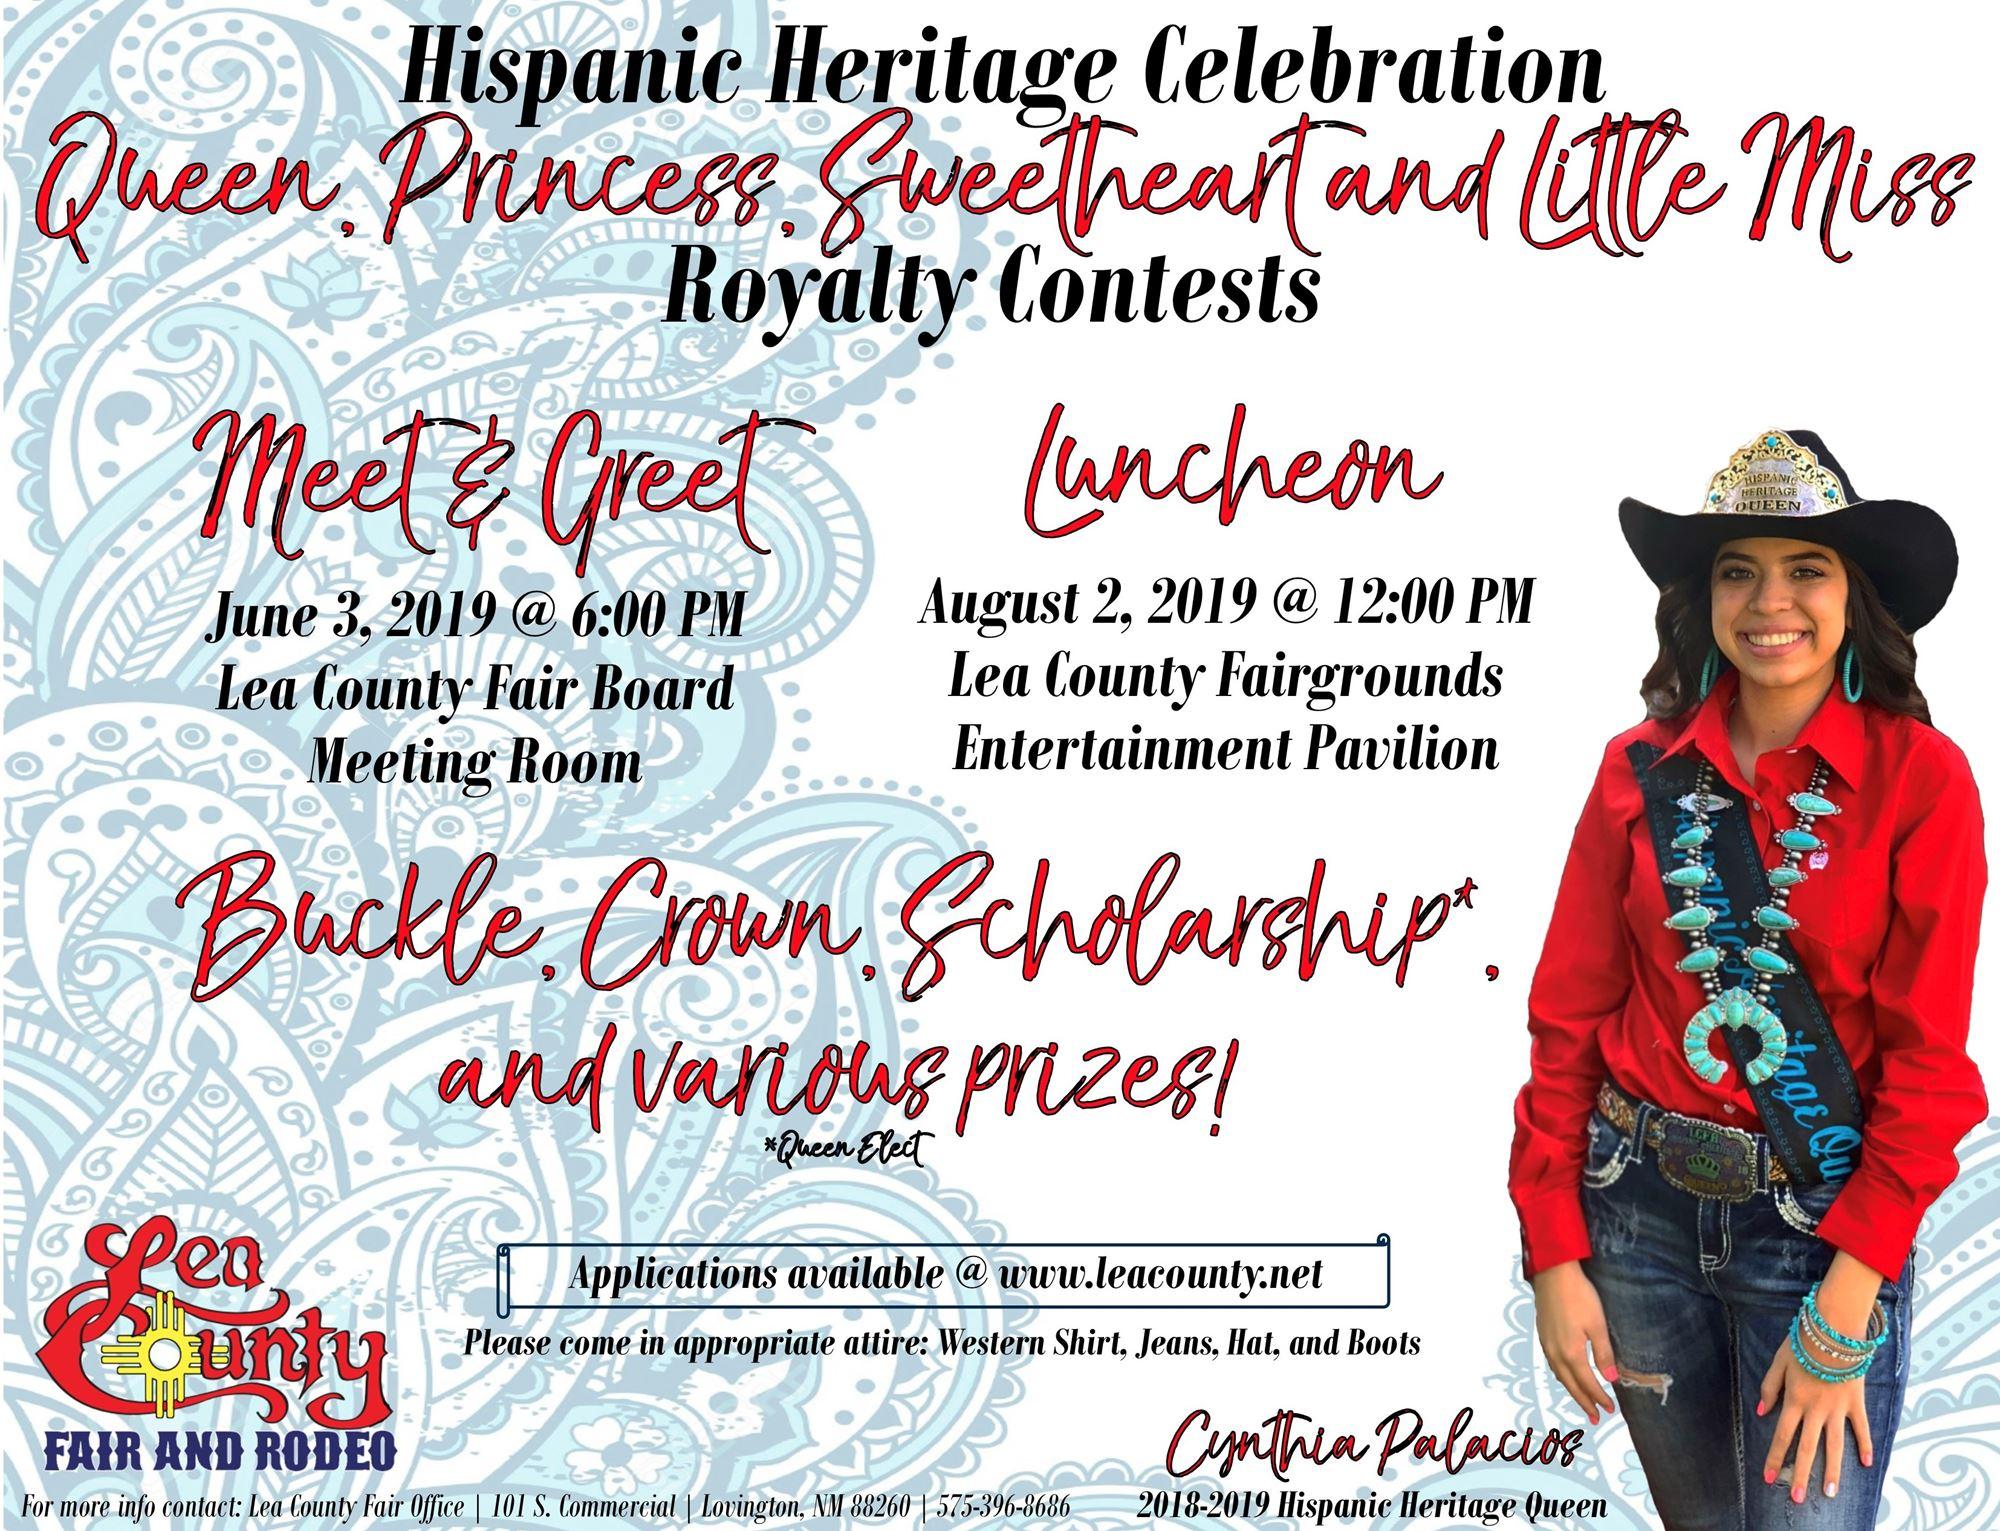 Hispanic Heritage Royalty Contest